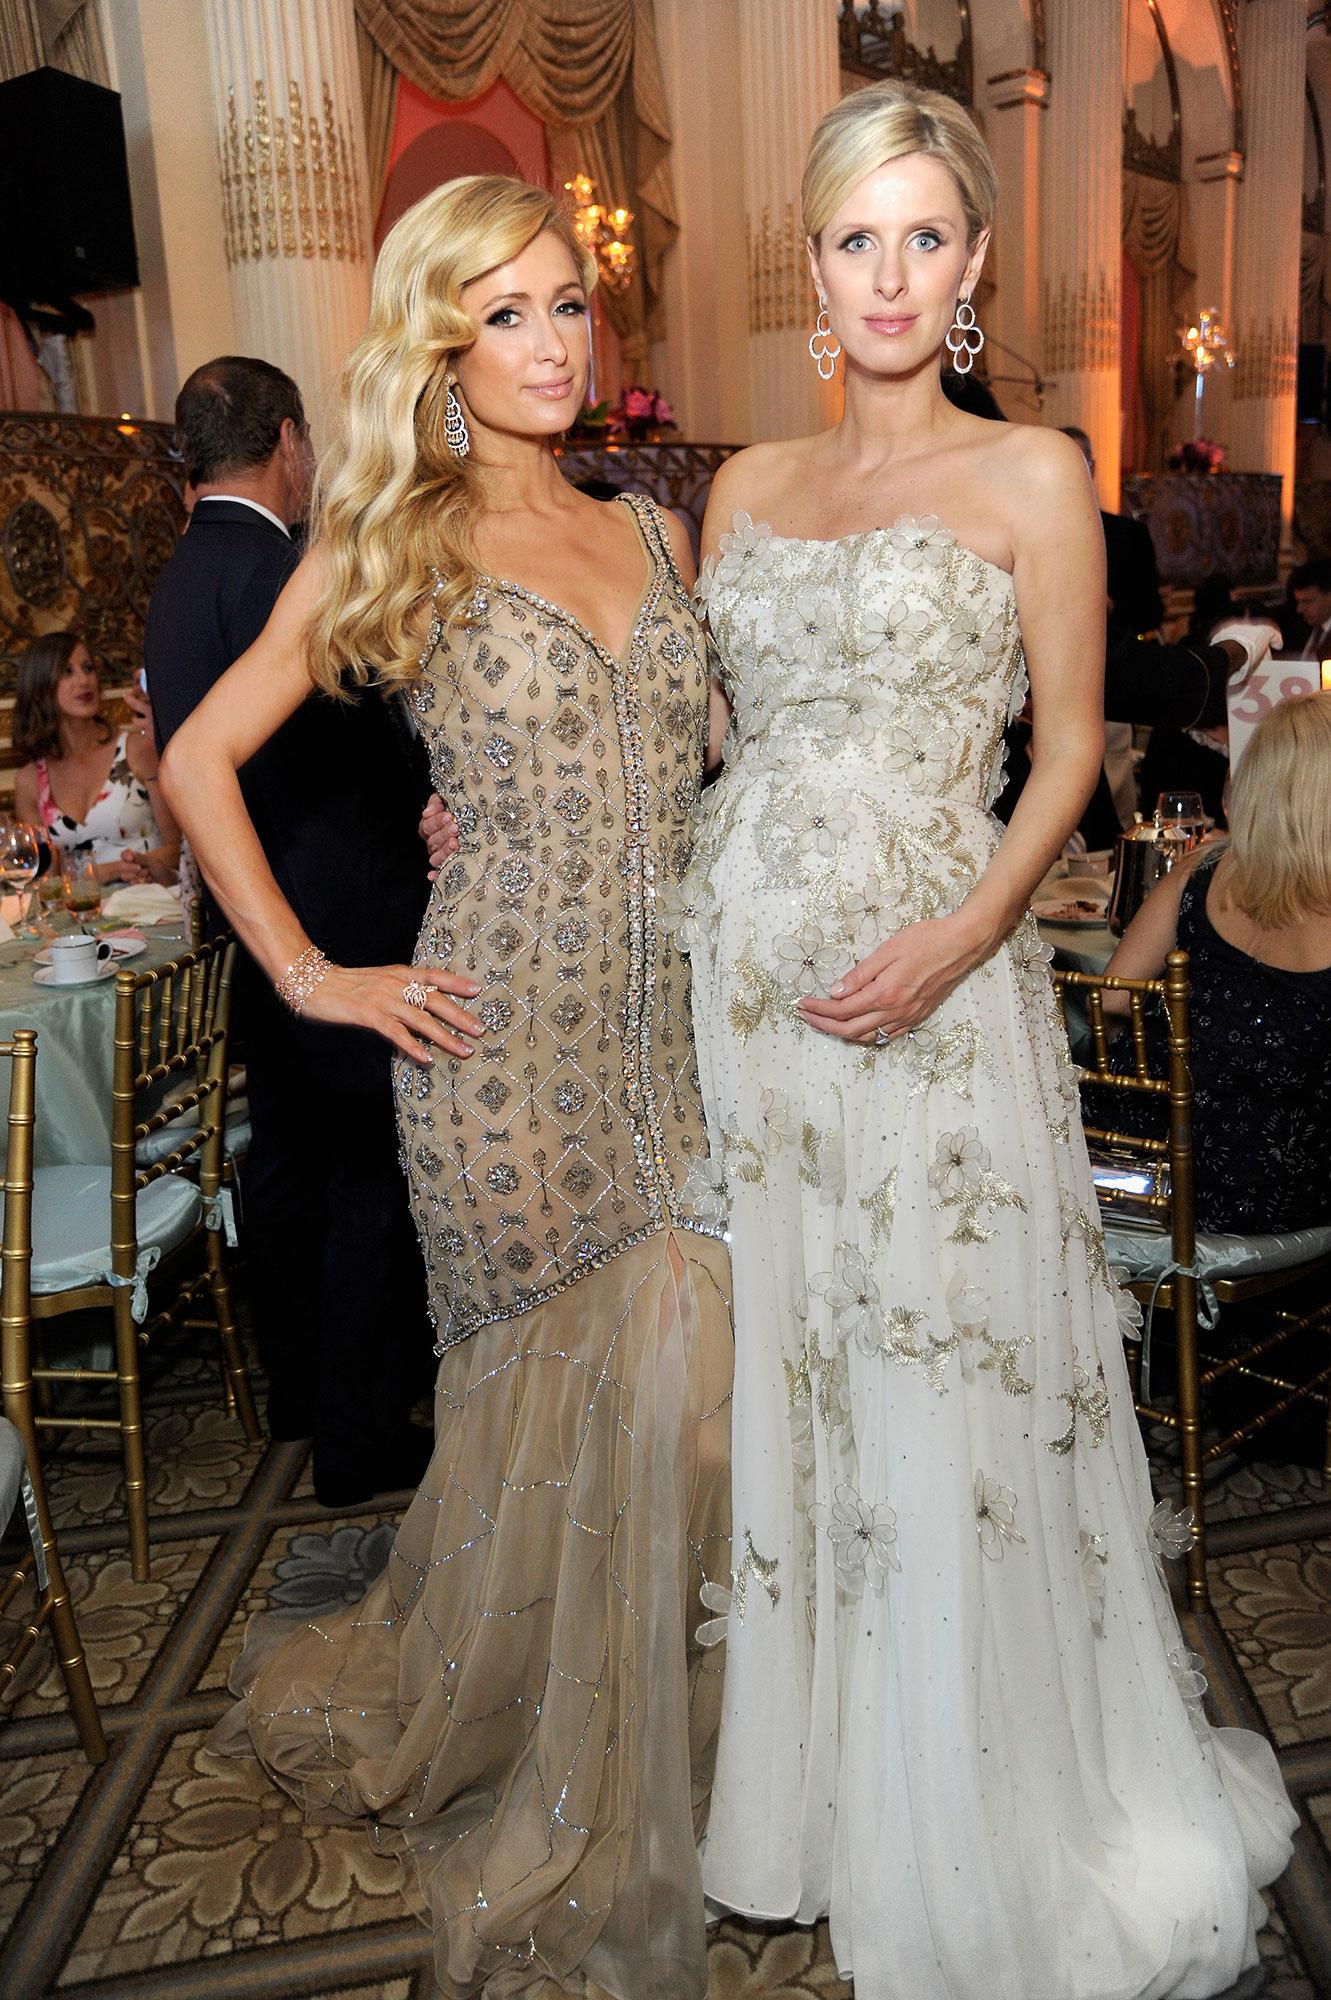 Paris Hilton Nicky Rothschild